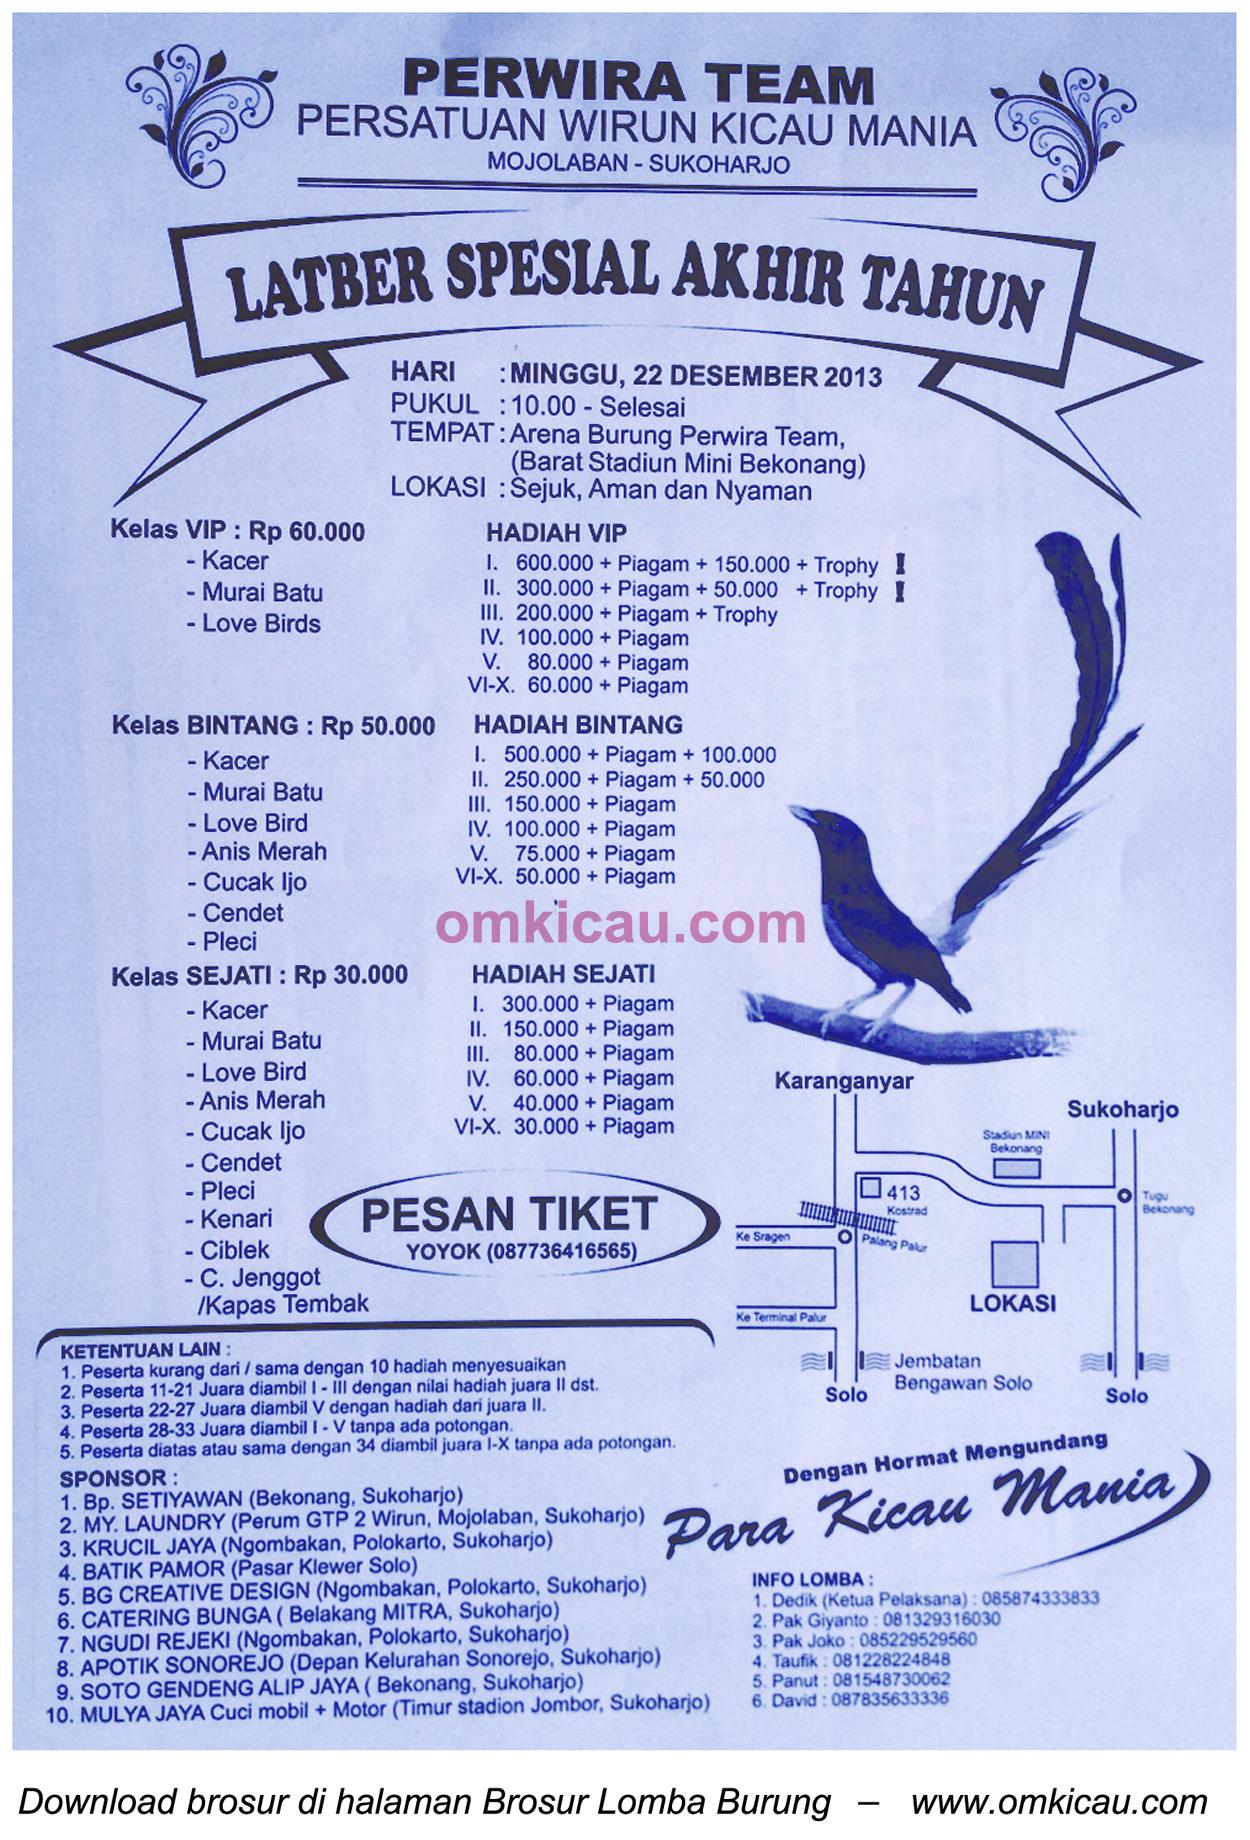 Brosur Latber Spesial Akhir Tahun Perwira Team, Sukoharjo, 22 Desember 2013